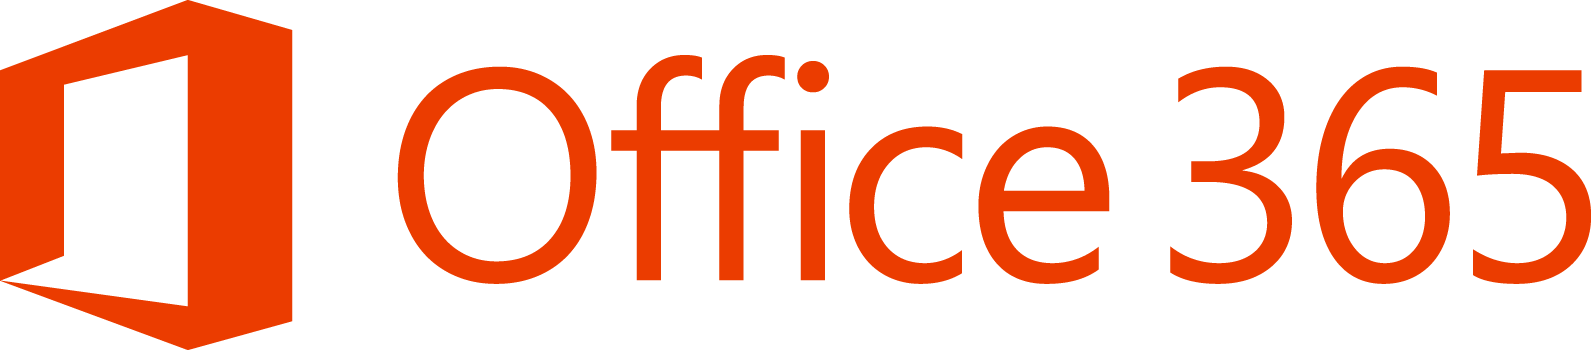 Office365logoOrange.png